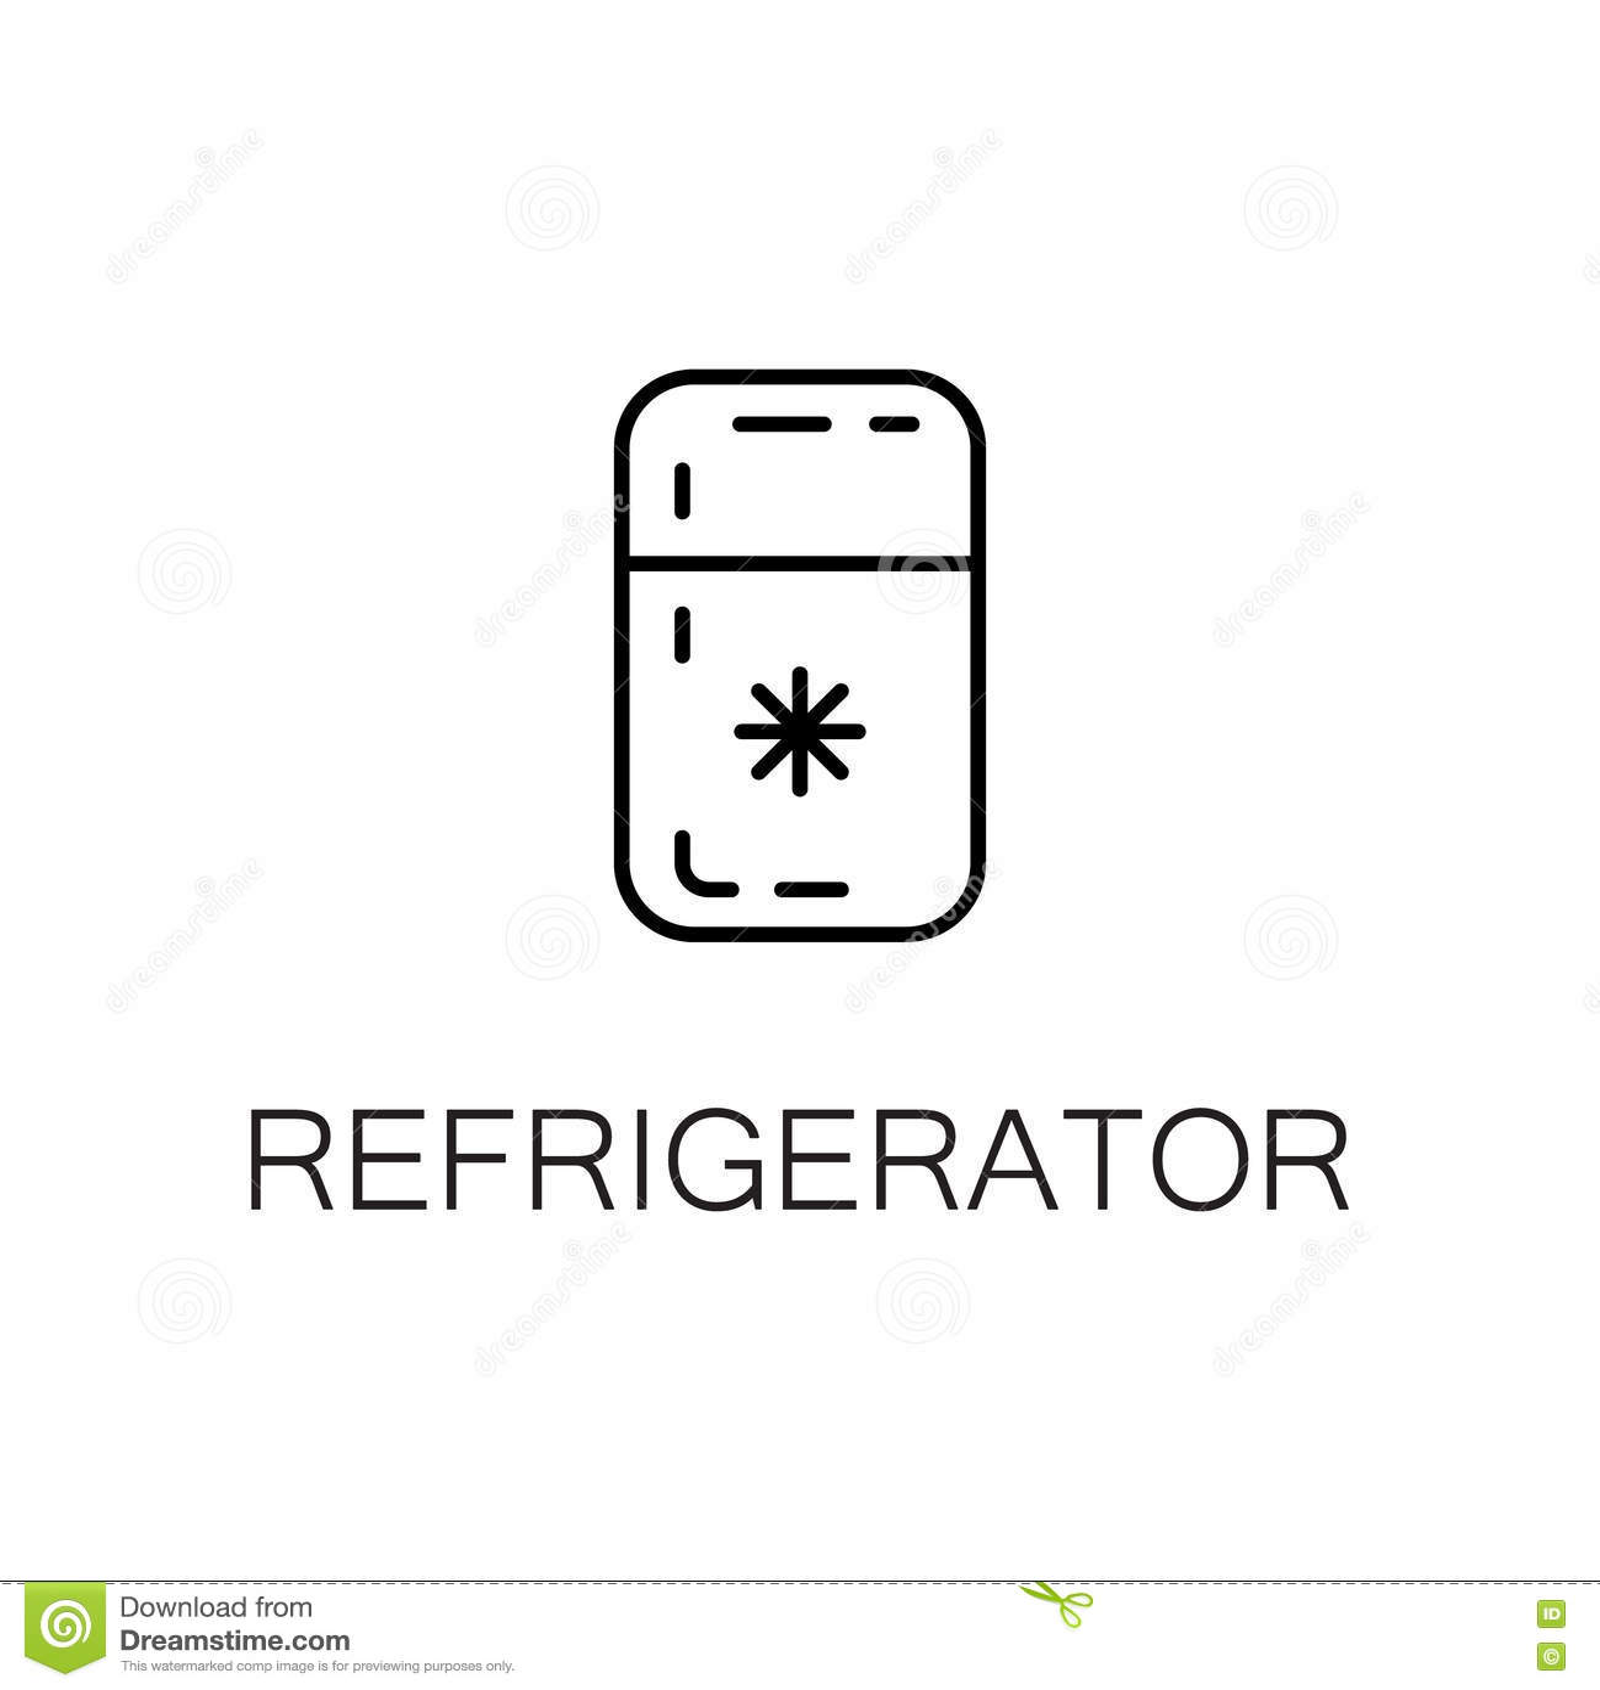 Refrigerator Flat Icon Or Logo For Web Design  Stock Vector